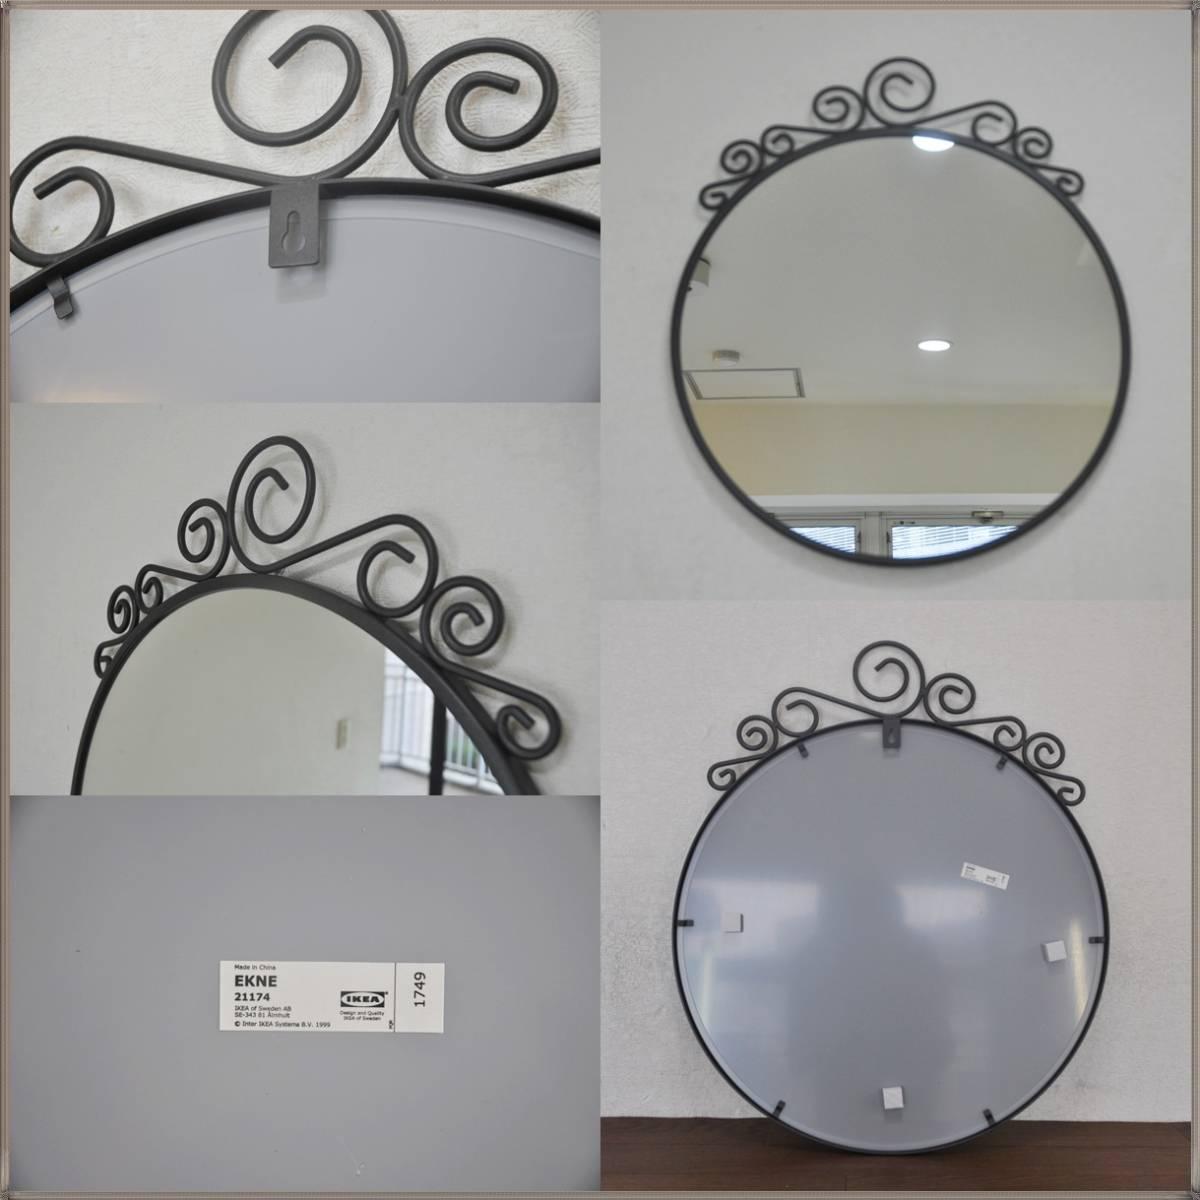 IKEA壁掛けミラーEbba Strandmark 100%無鉛コーティング鏡 EKNEデザイナー飛散防止フィルム貼り鏡イケア 新品・未使用_画像6